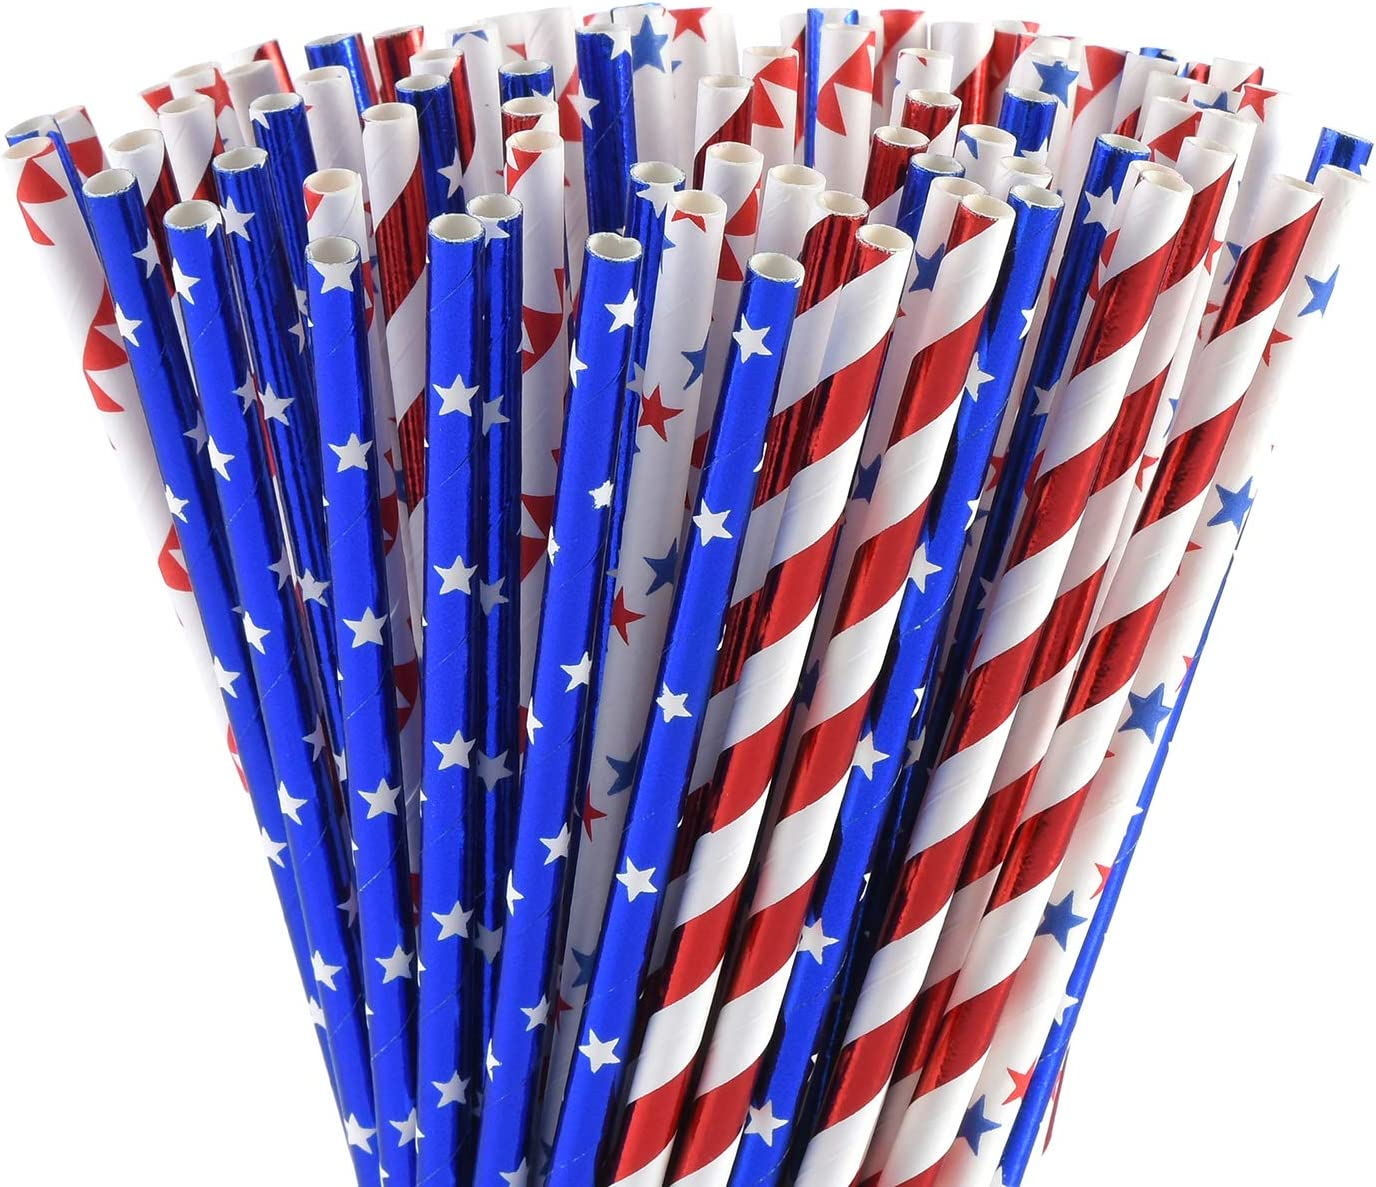 Party Favor BlueRed Striped Paper Straws Cake Pop Sticks Party Decor Supply